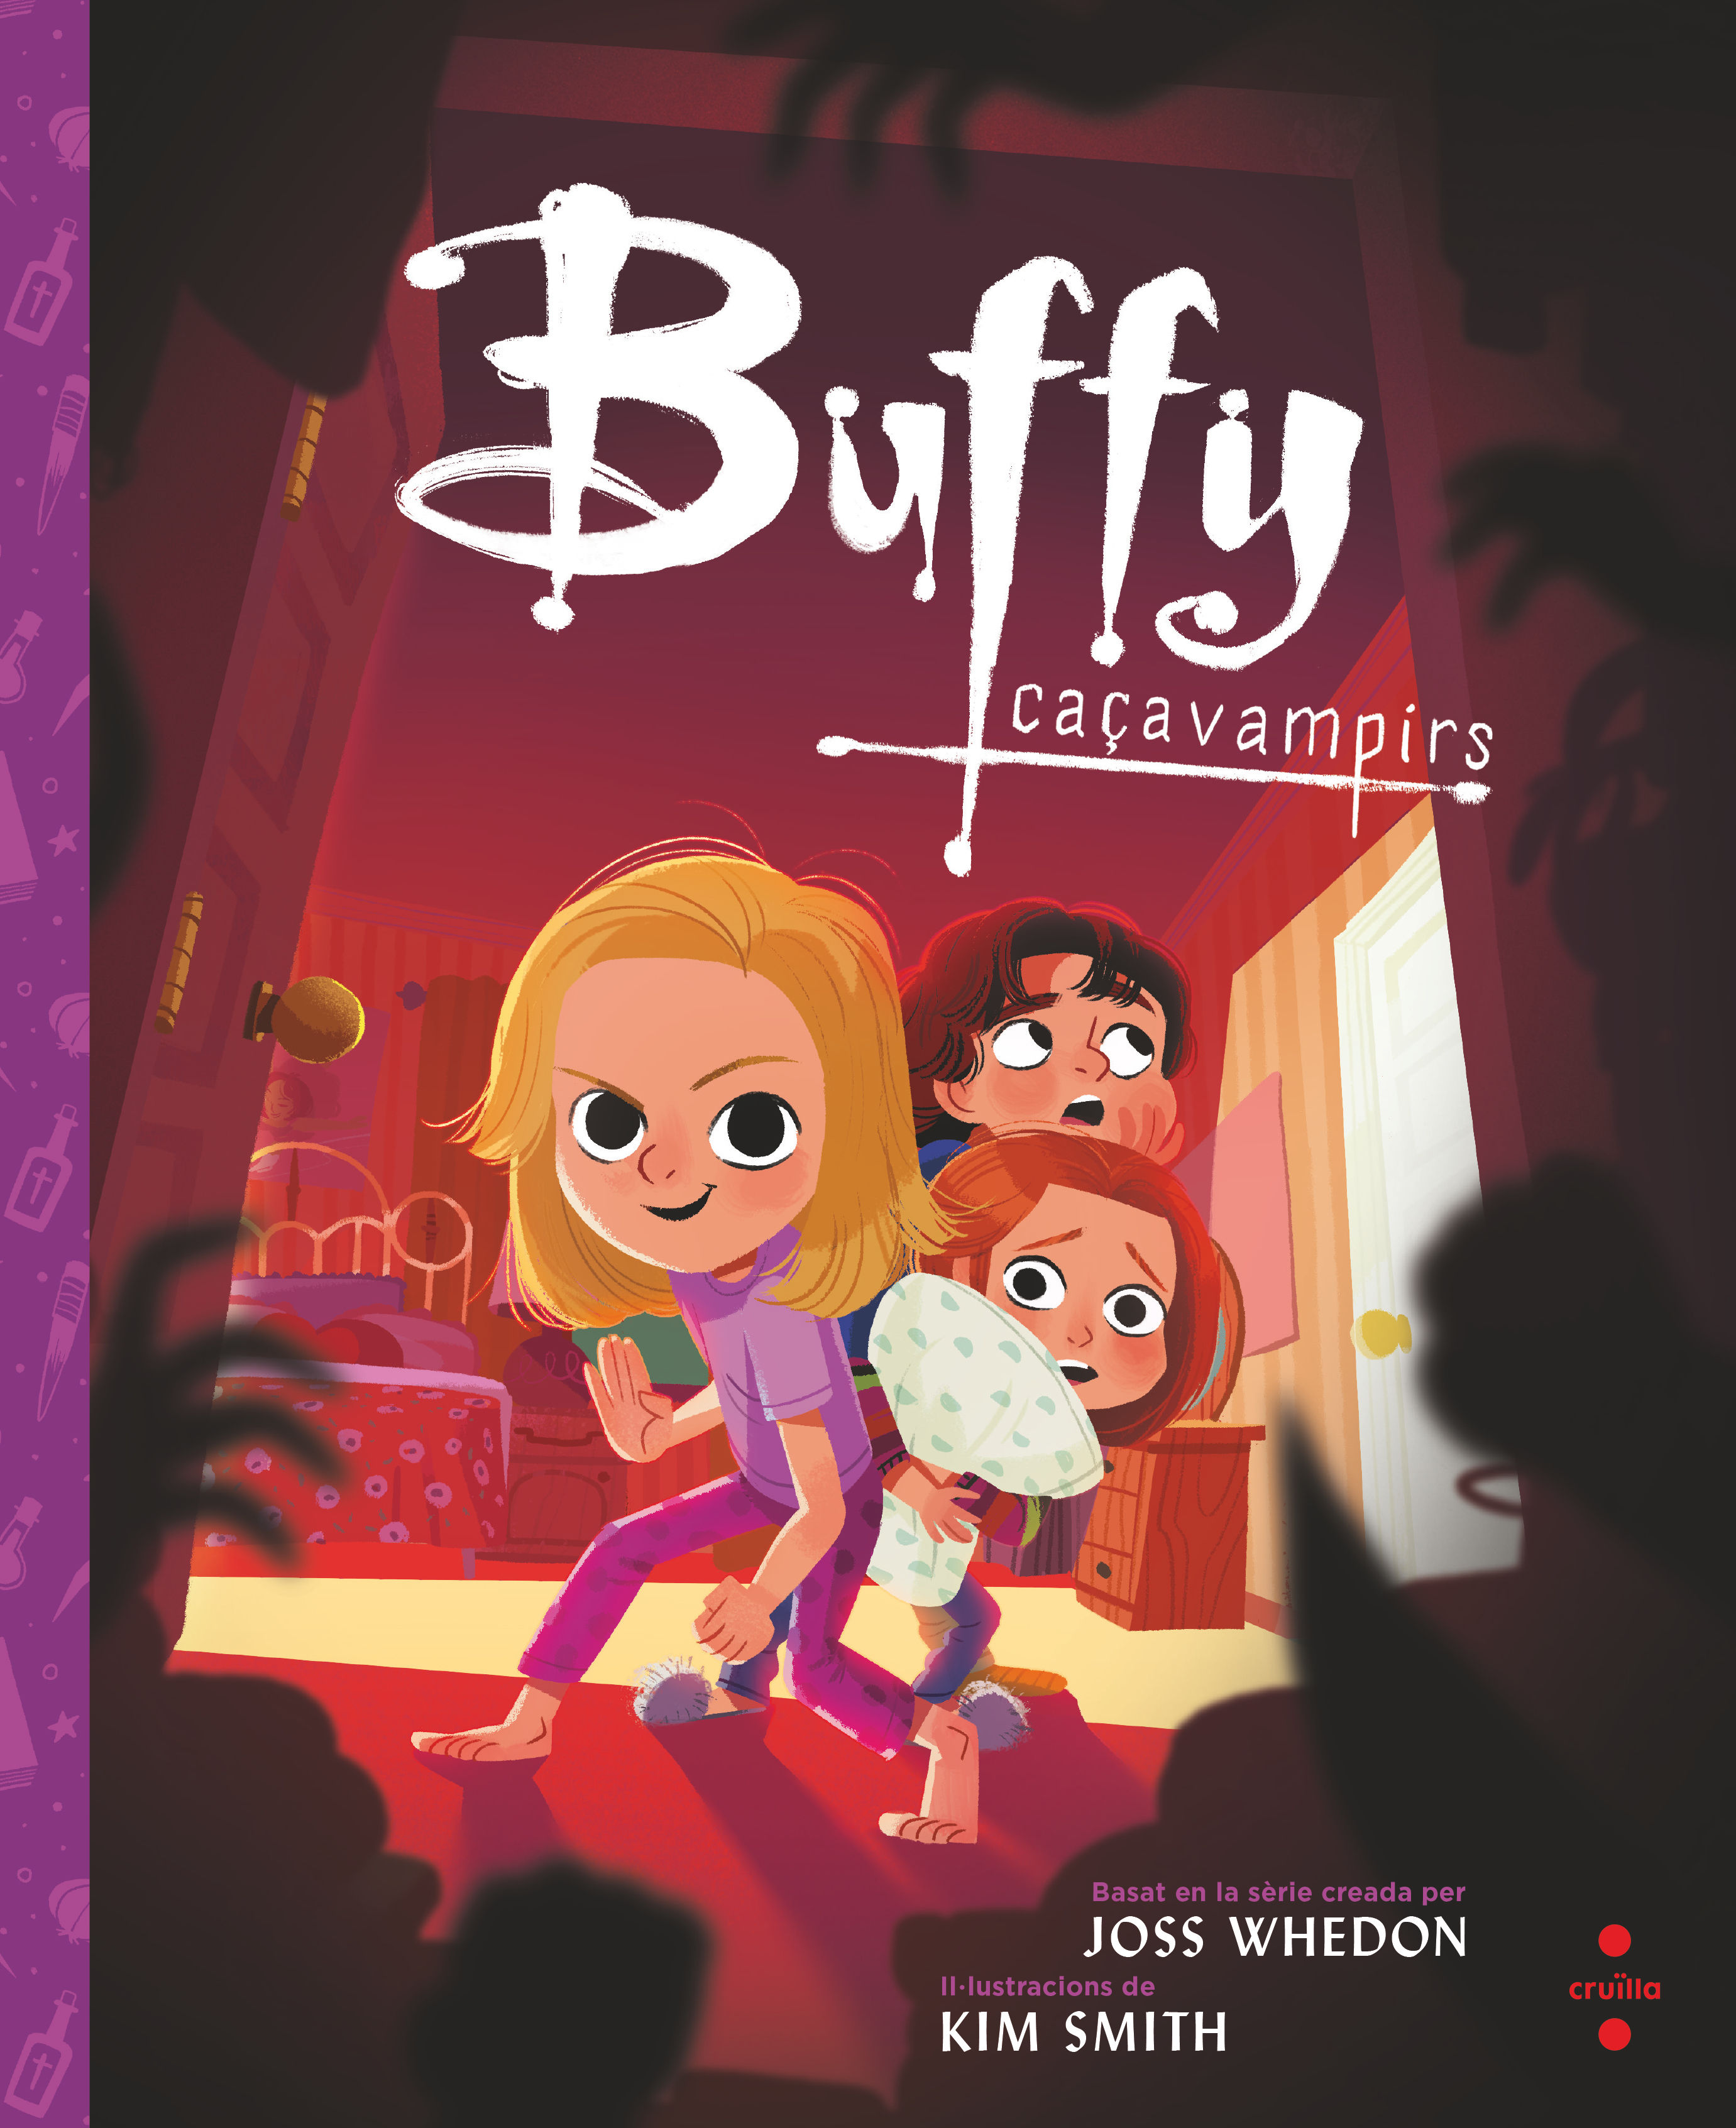 BUFFY CAÇAVAMPIRS